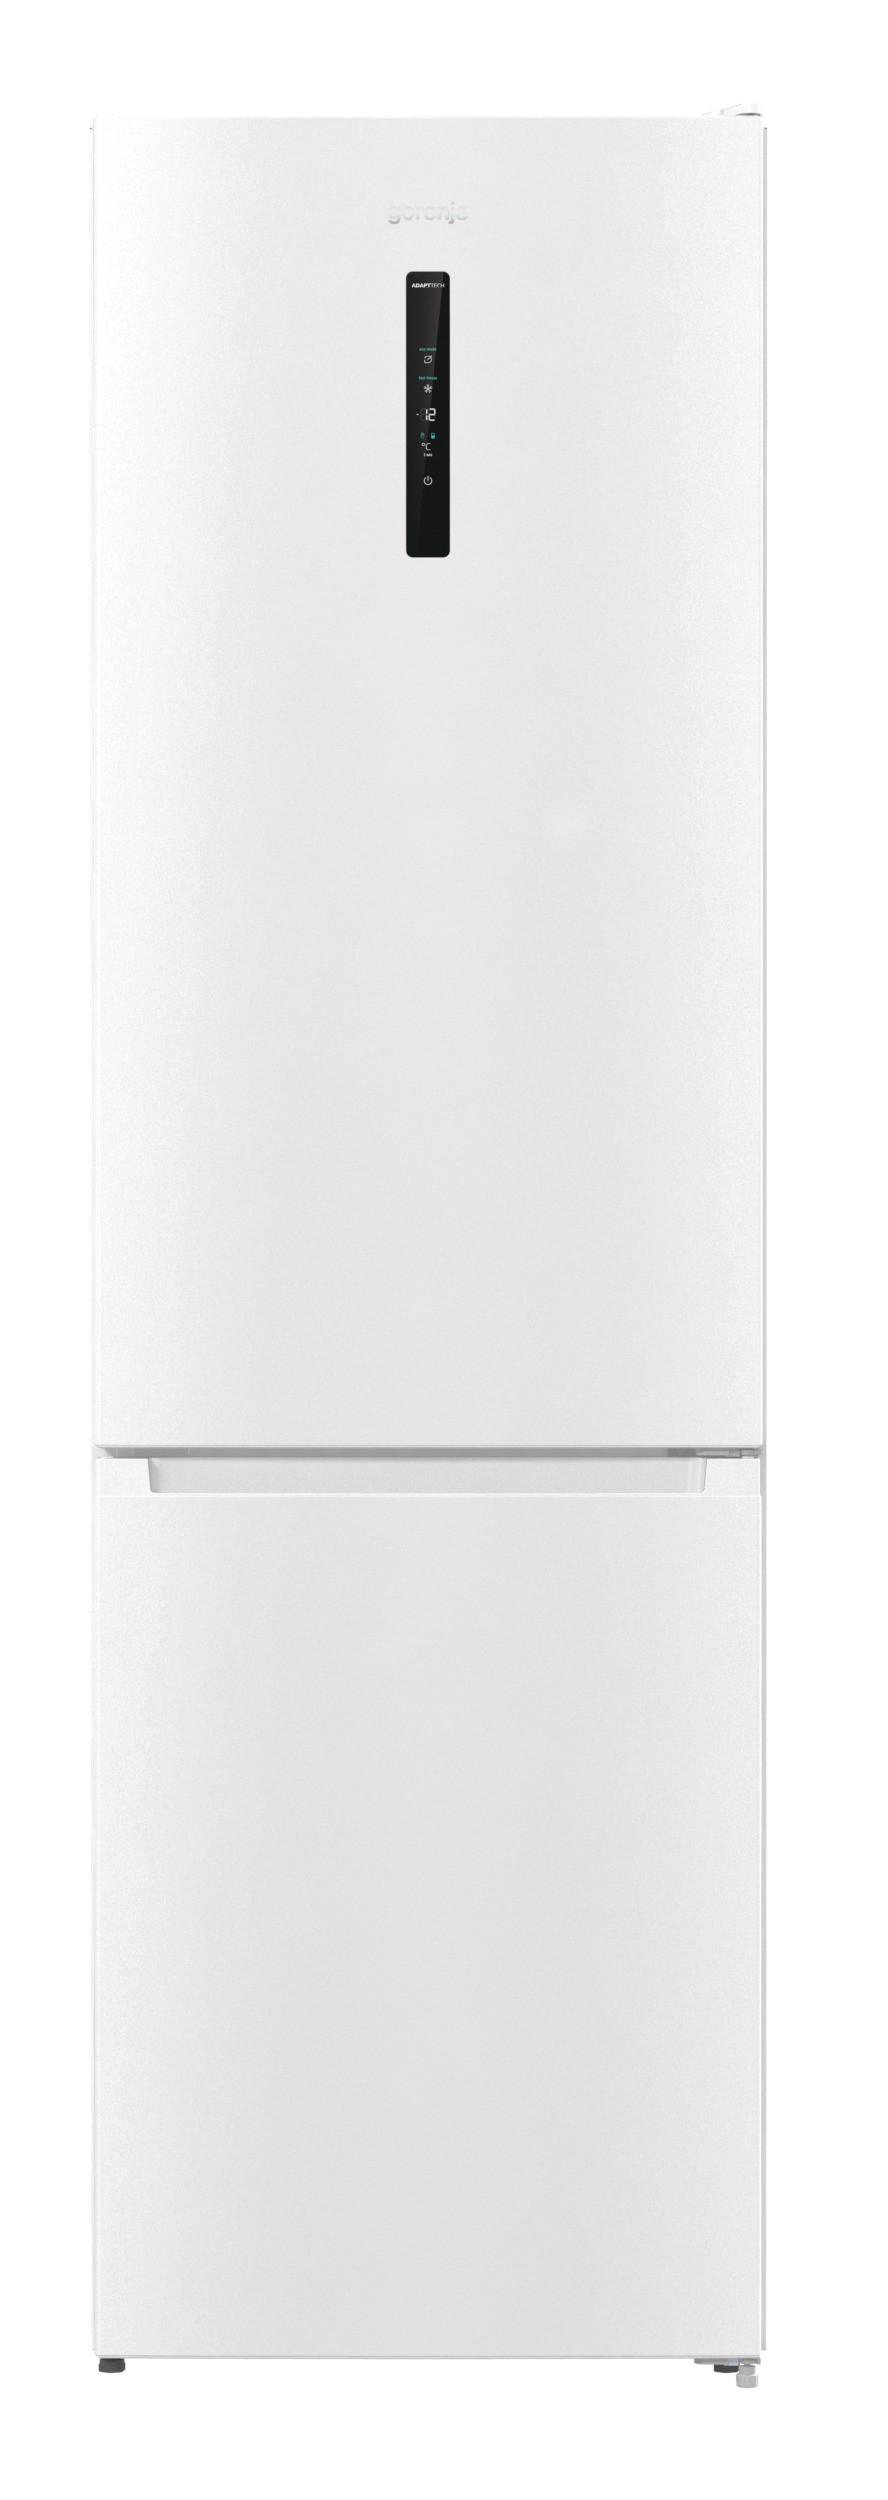 Gorenje Refrigerator NRK6202AW4 Energy efficiency class E, Free standing, Combi, Height 200 cm, No Frost system, Fridge net capacity 235 L, Freezer net capacity 96 L, Display, 38 dB, White